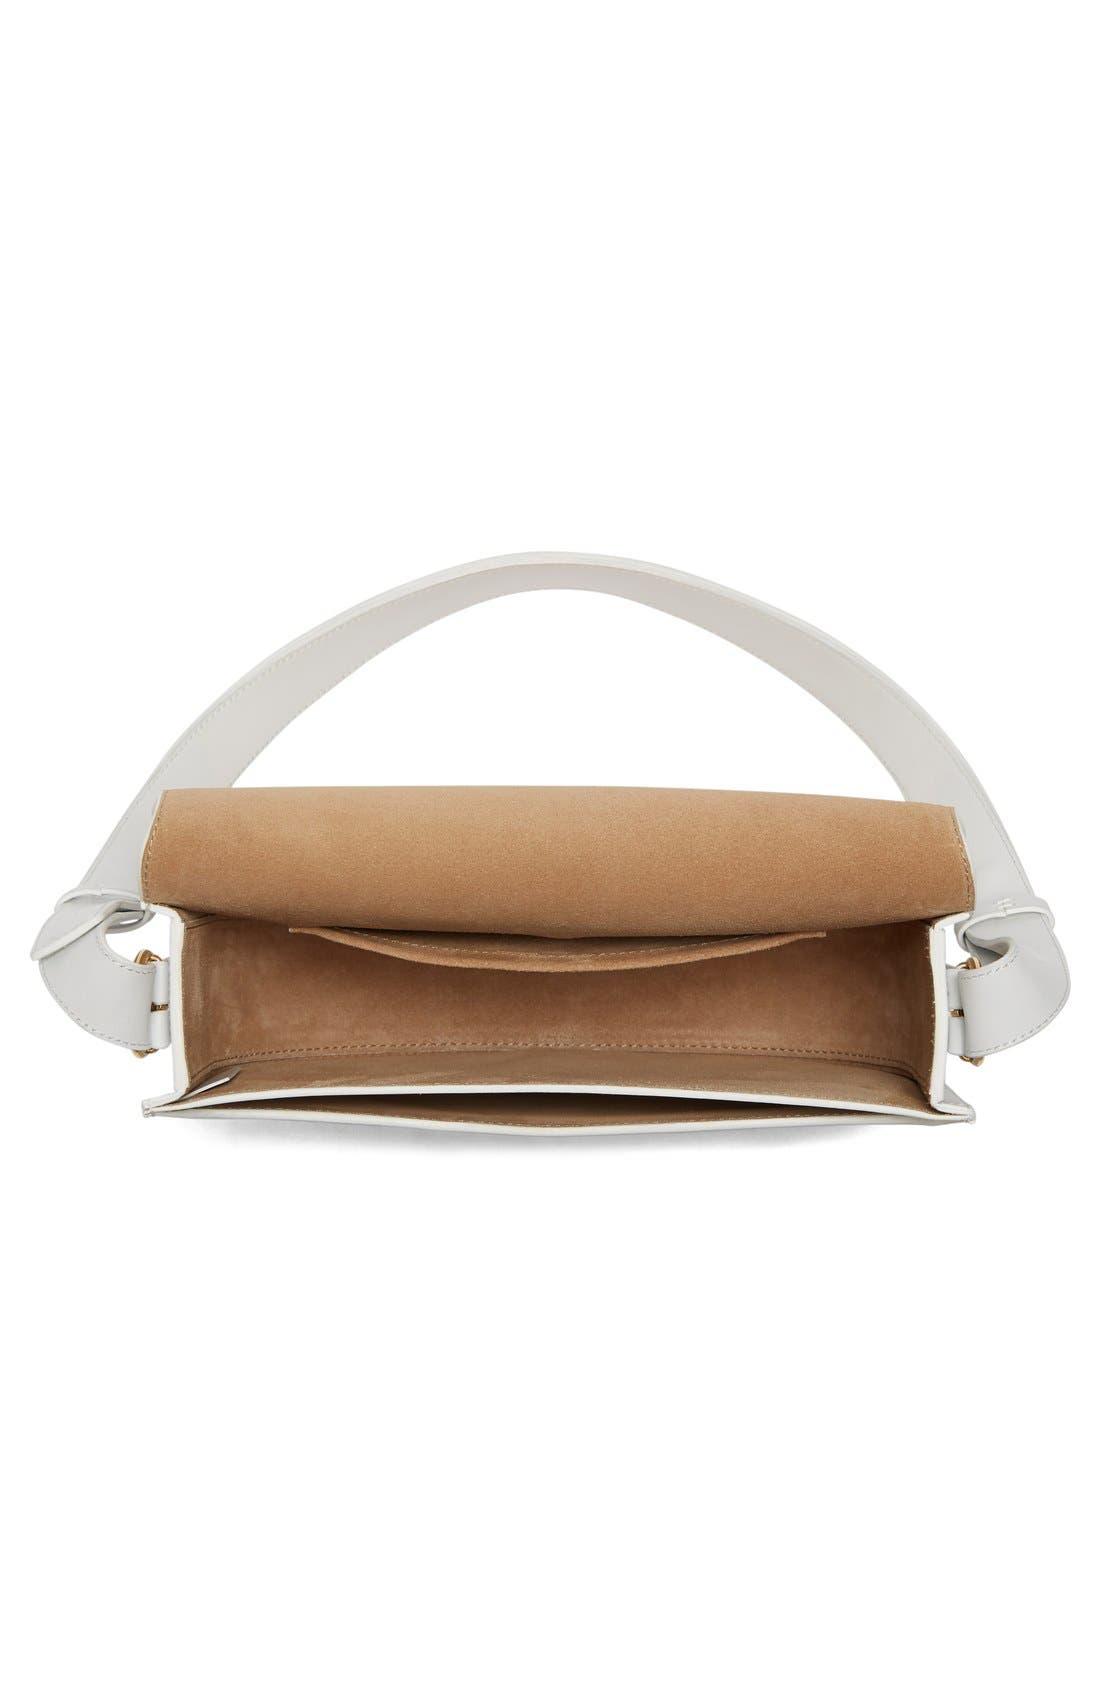 Half Moon Box Shoulder Bag,                             Alternate thumbnail 6, color,                             WHITE